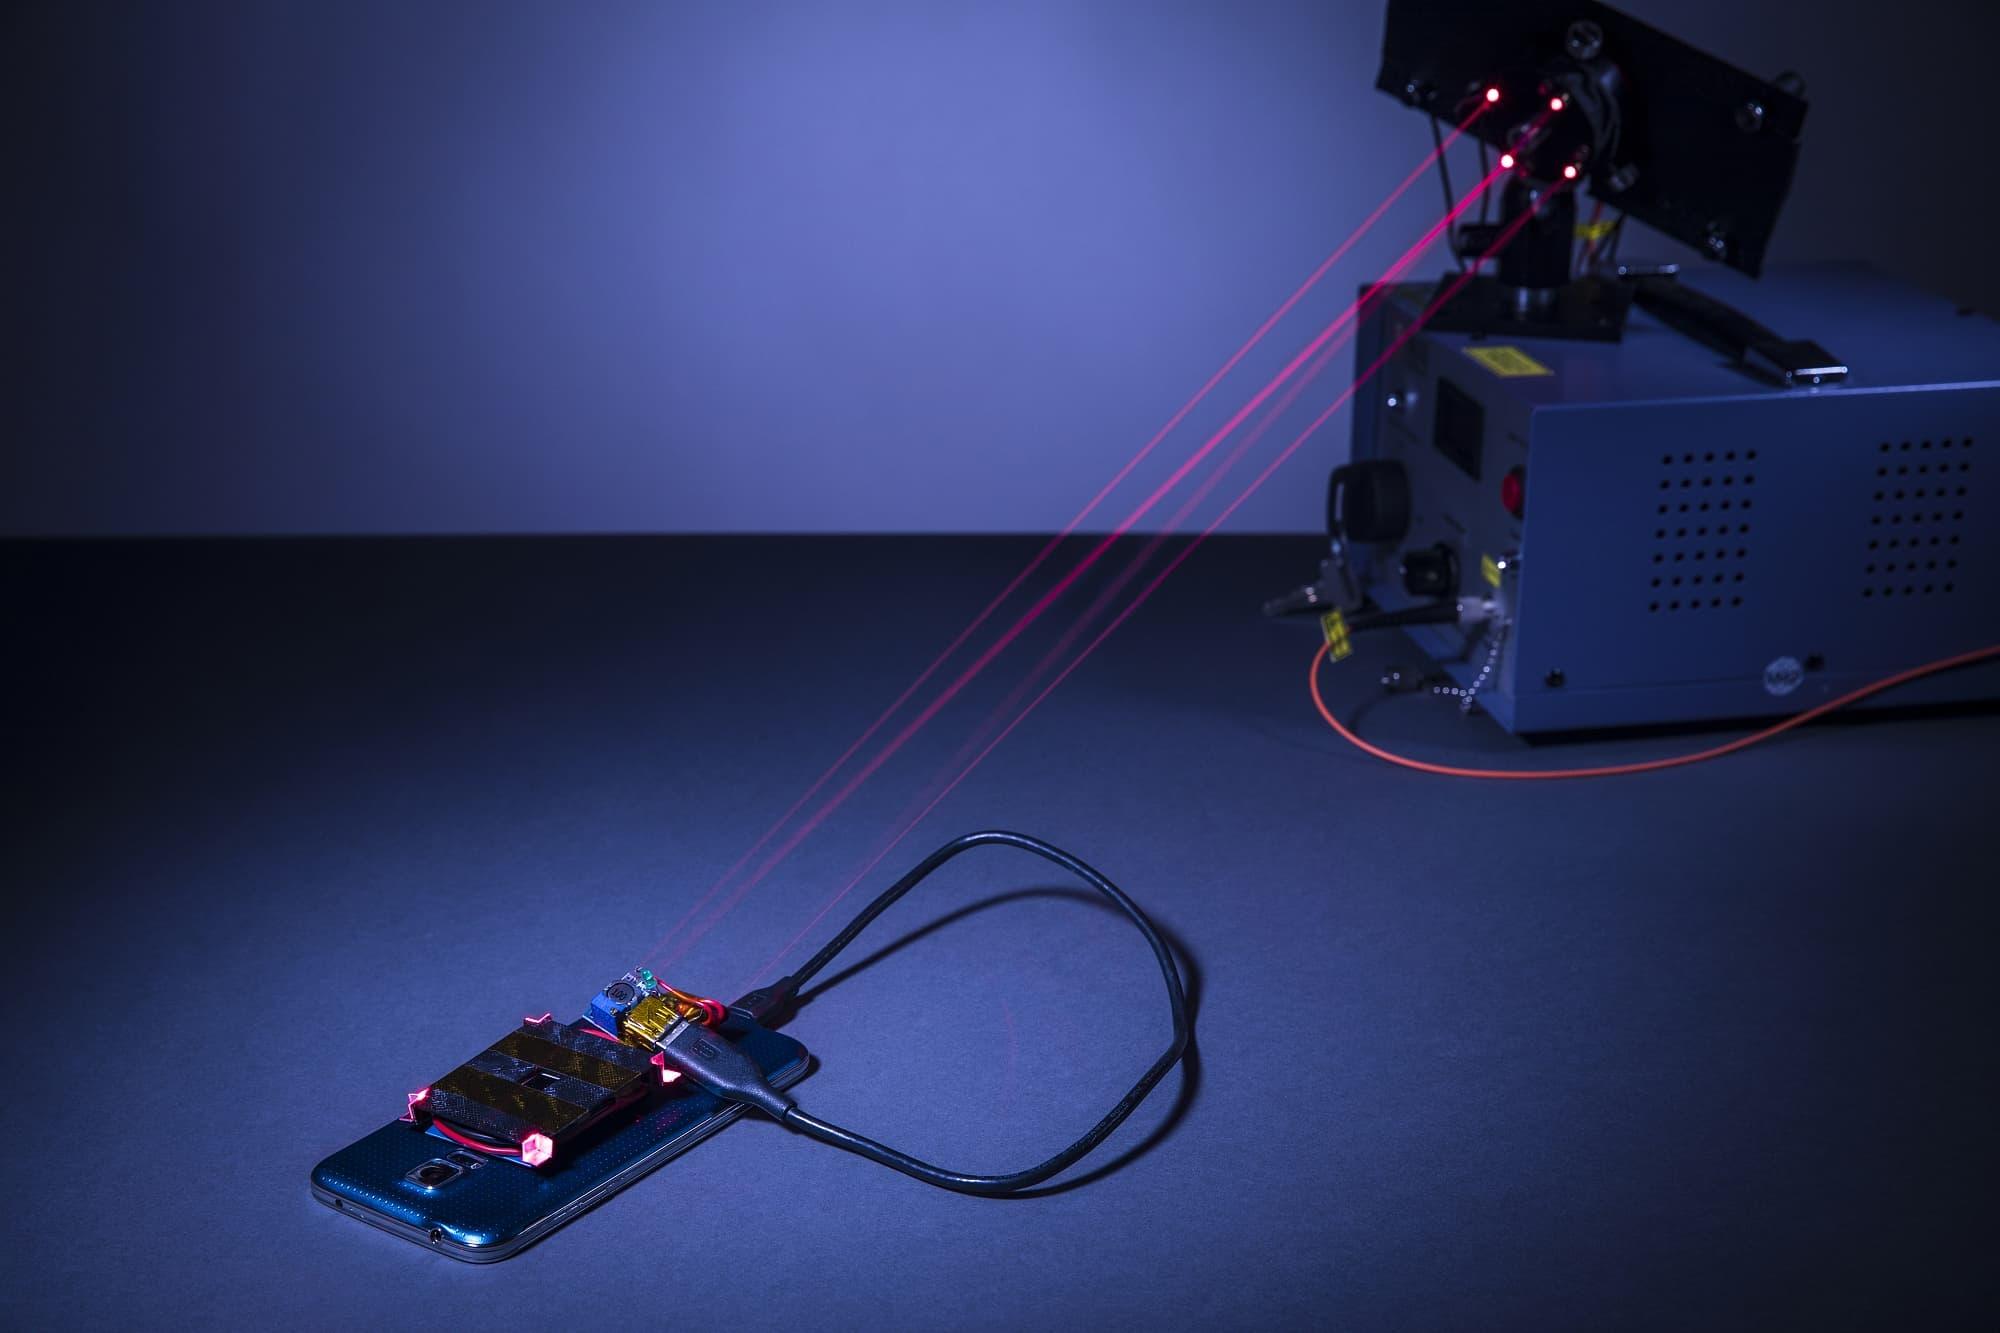 laserstrahl-l-dt-smartphone-akkus-kabellos